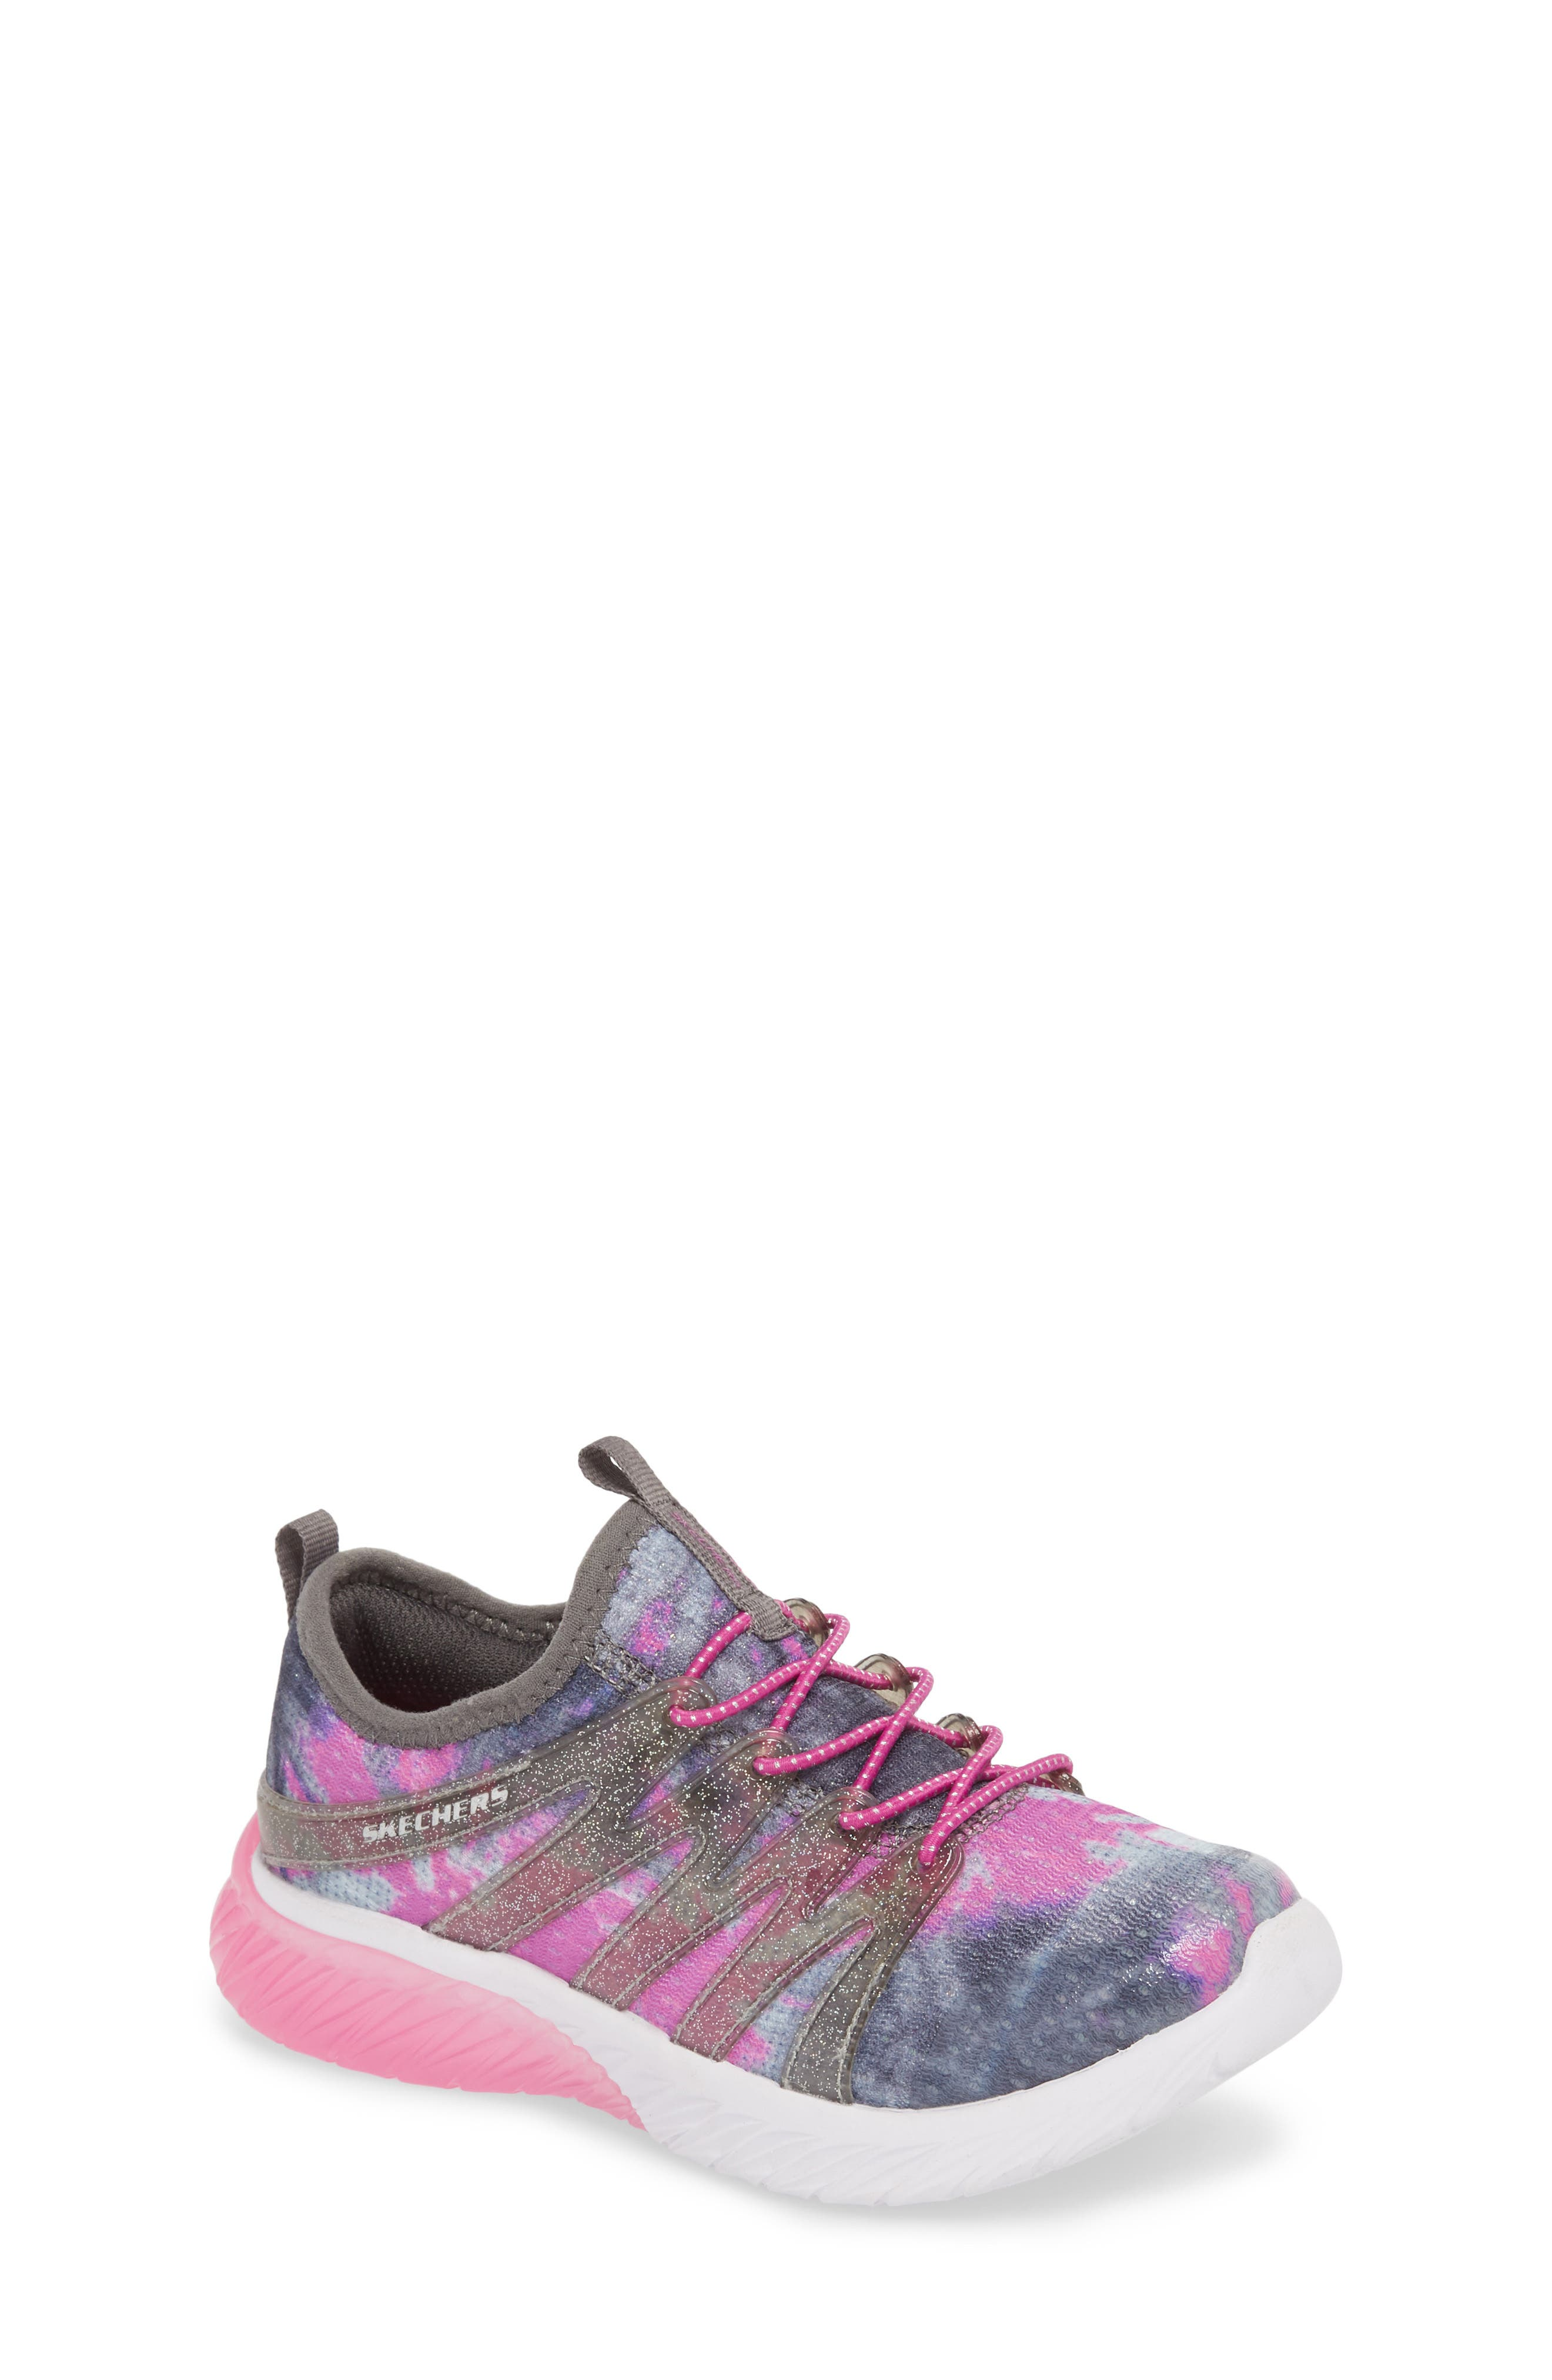 Skech Gem Glitter Sneaker,                             Main thumbnail 1, color,                             Charcoal/ Hot Pink